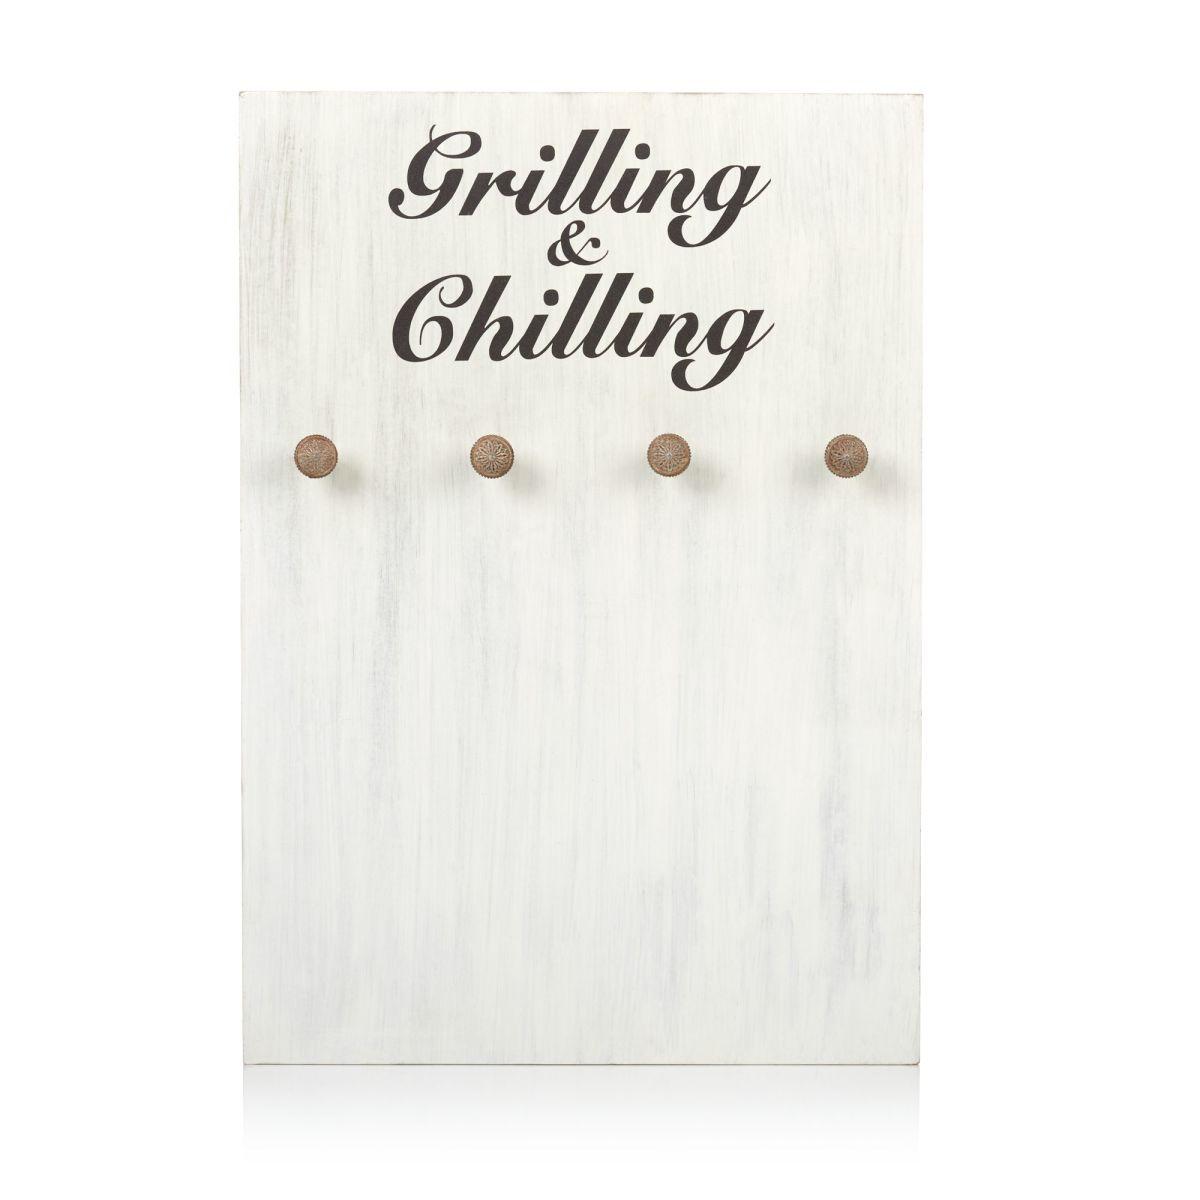 """Wandboard, """"Grilling & Chilling"""""""